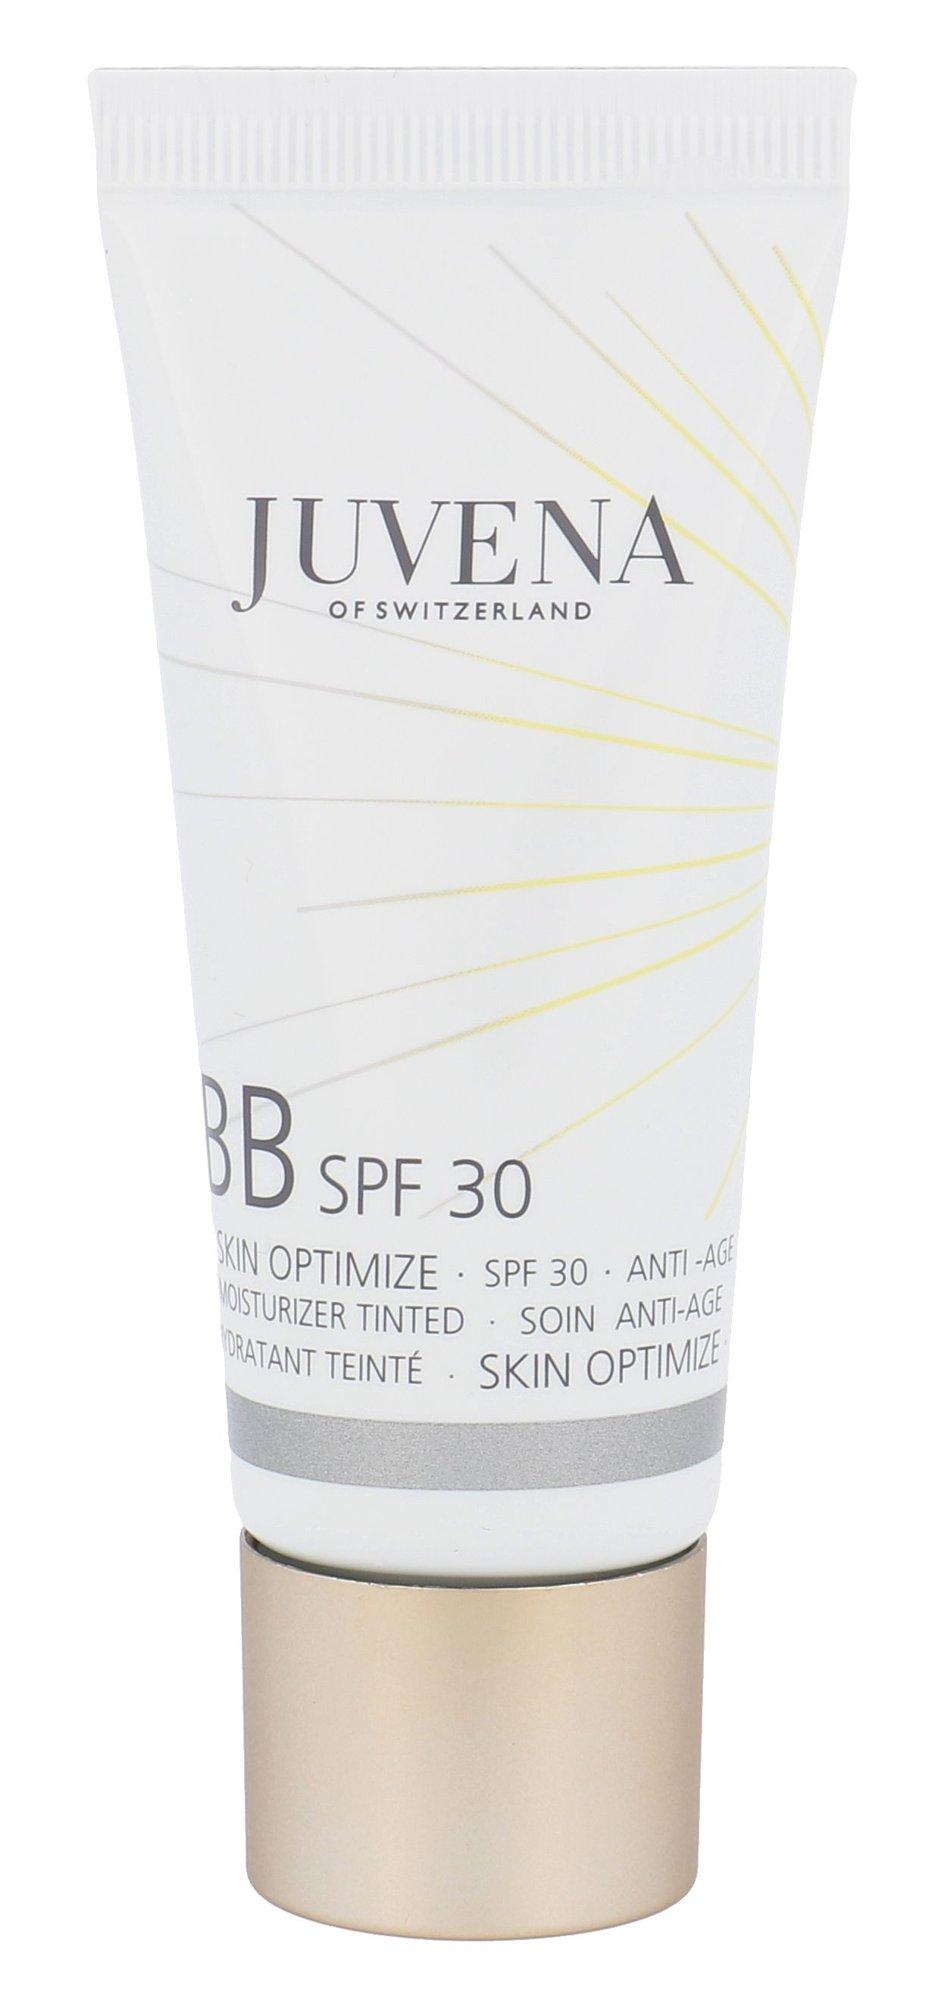 Juvena Skin Optimize BB Moisturizer SPF30 Cosmetic 40ml